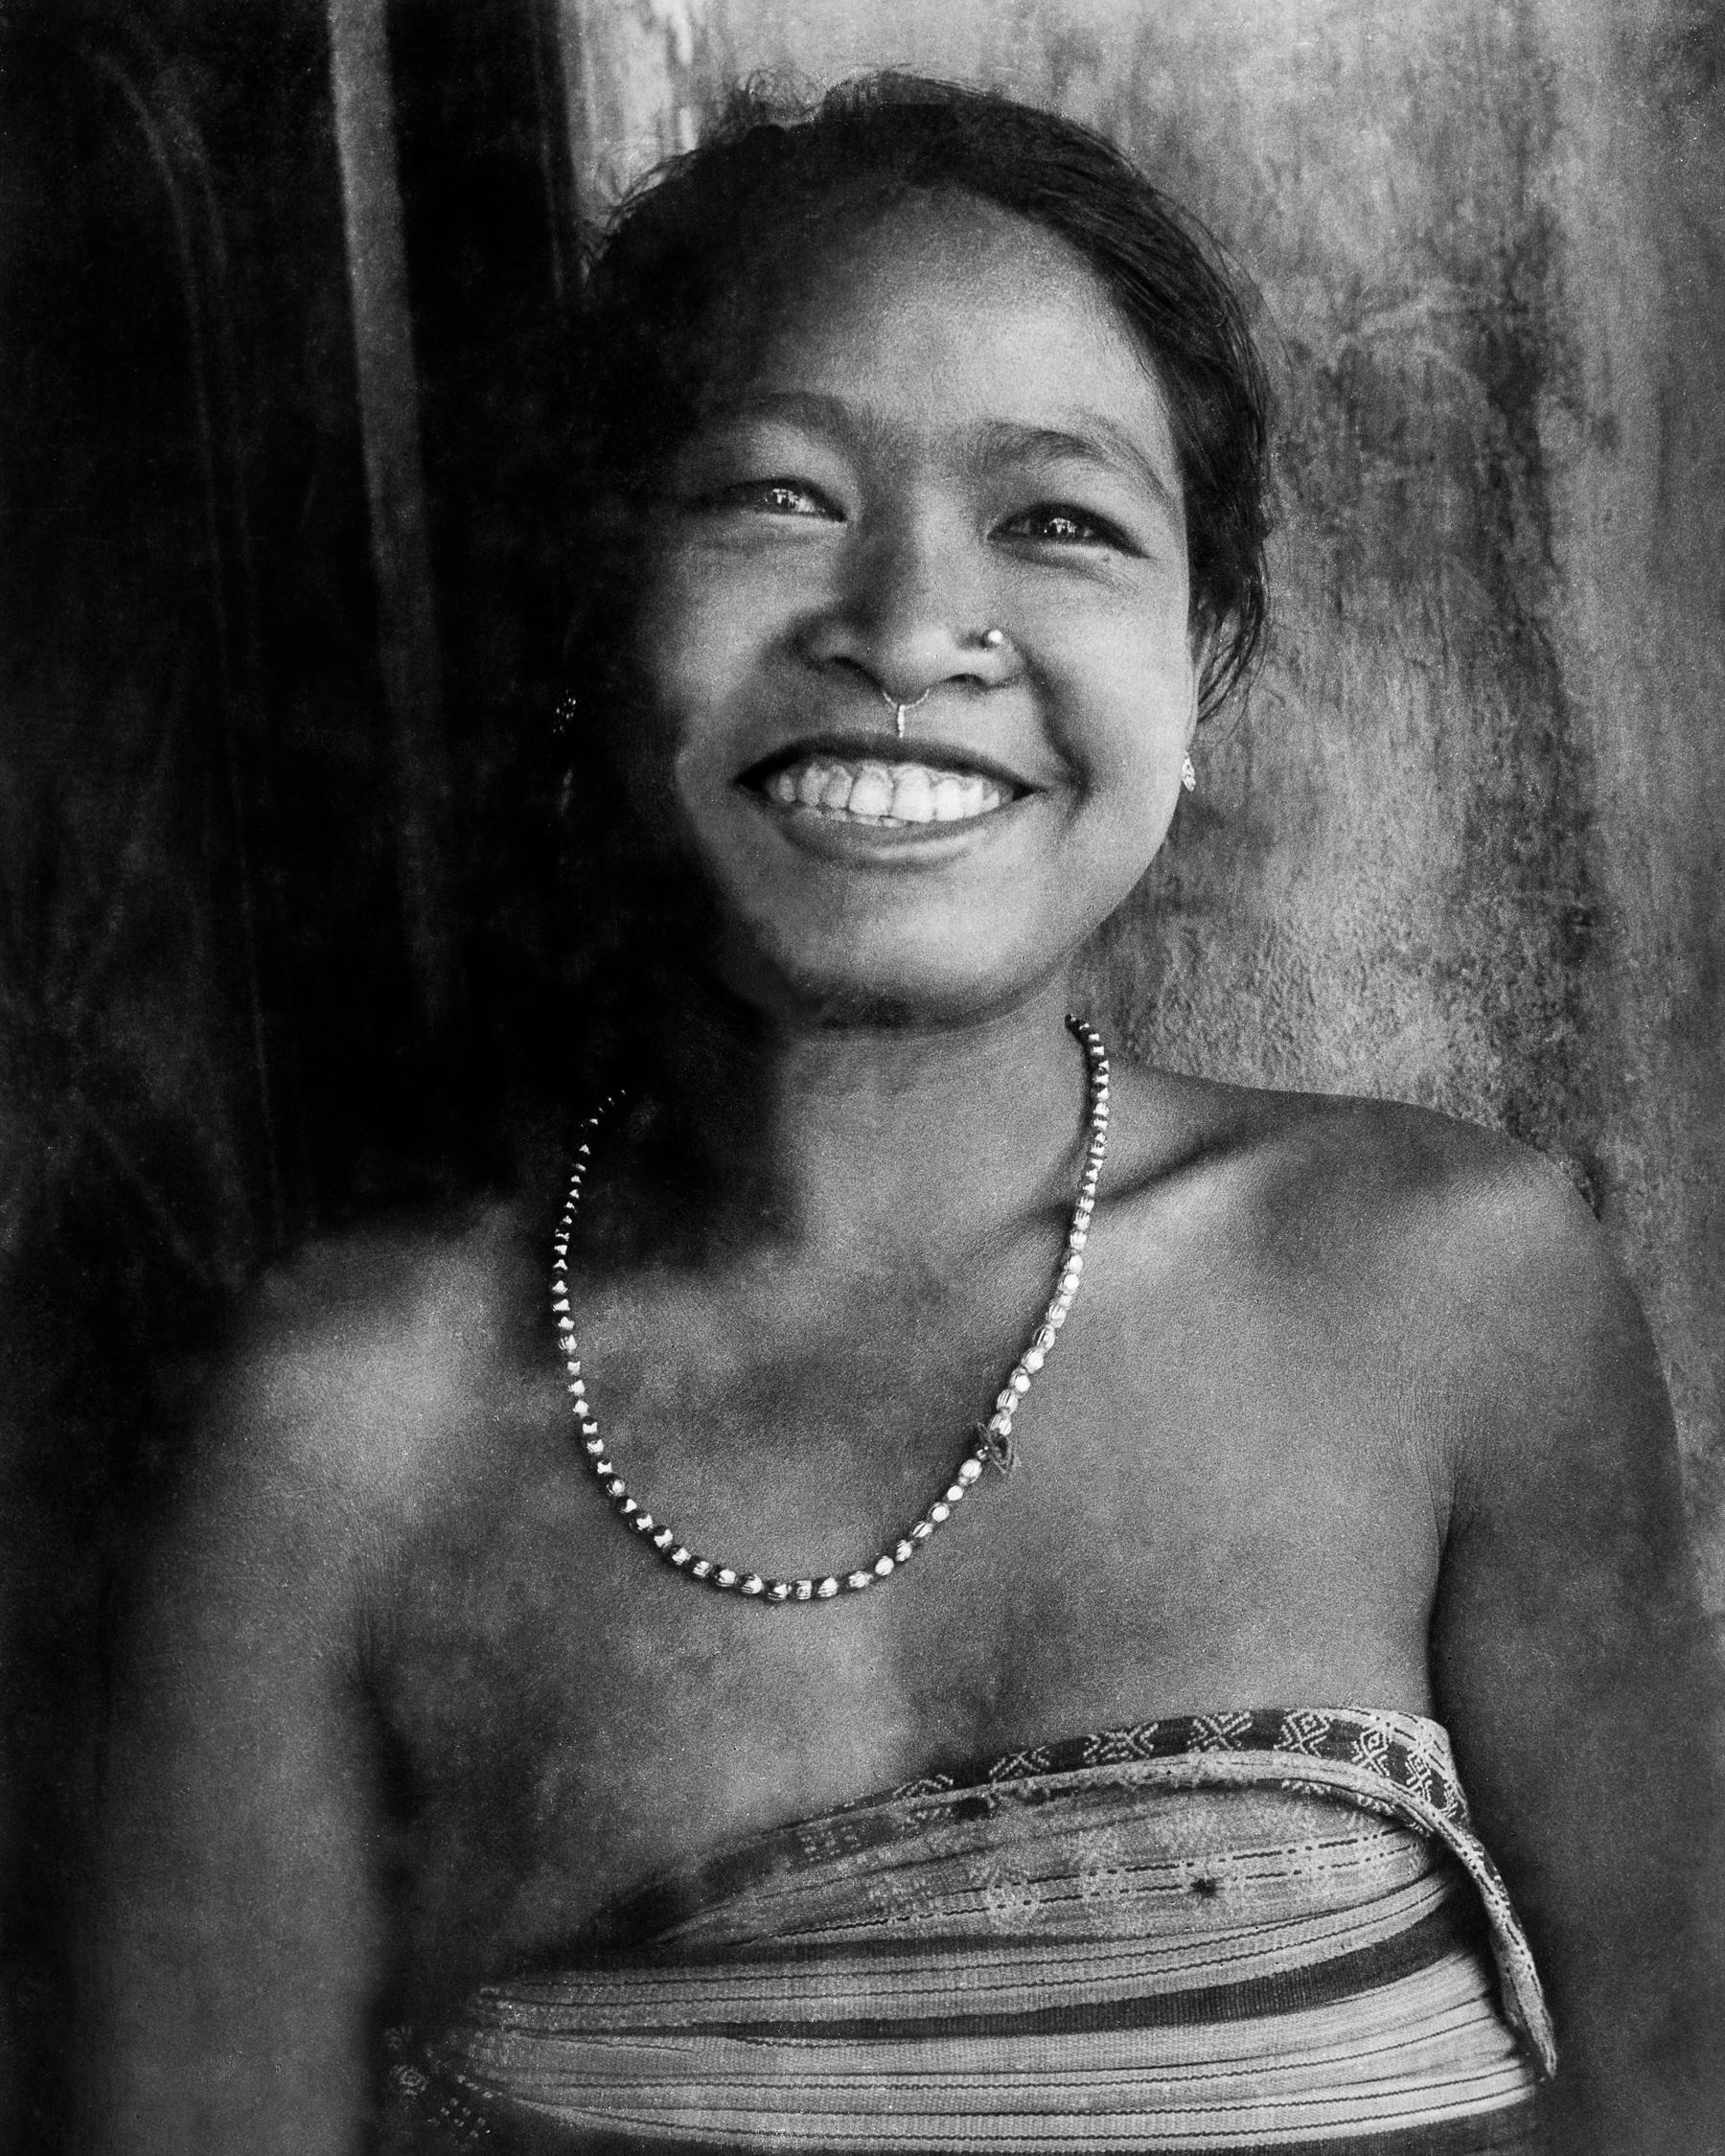 Deb Barma girl wearing a risha and  ganthi bwtang ,  ganthi  meaning beads and  bwtang  meaning necklace.  c.1974